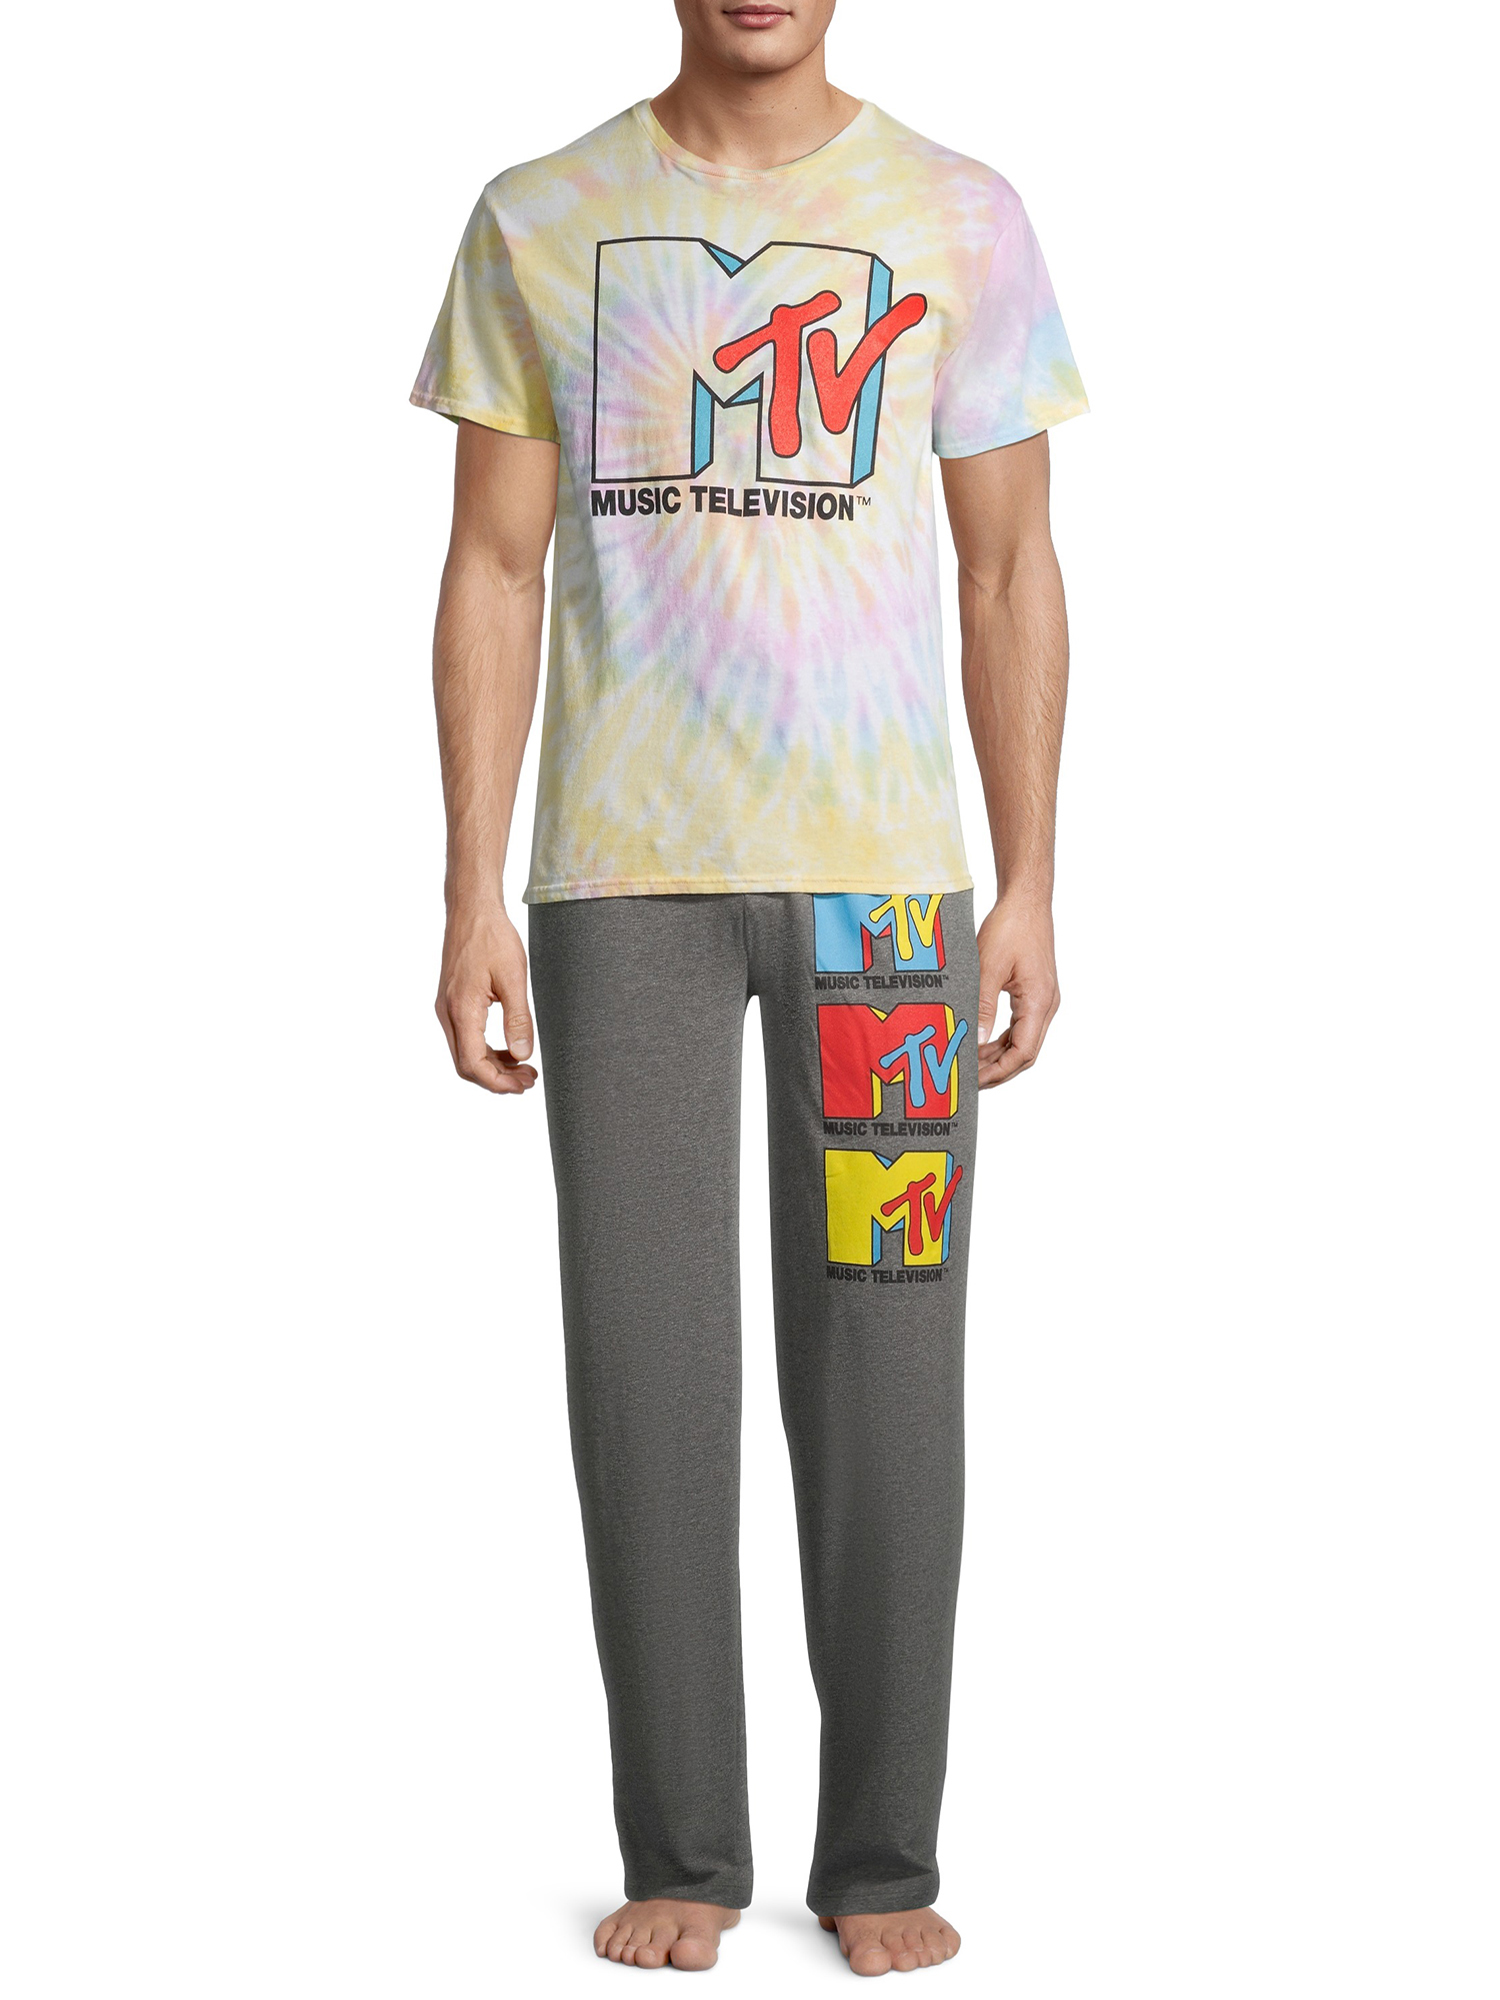 MTV - MTV Men's Tie Dye Lounge Set - Walmart.com